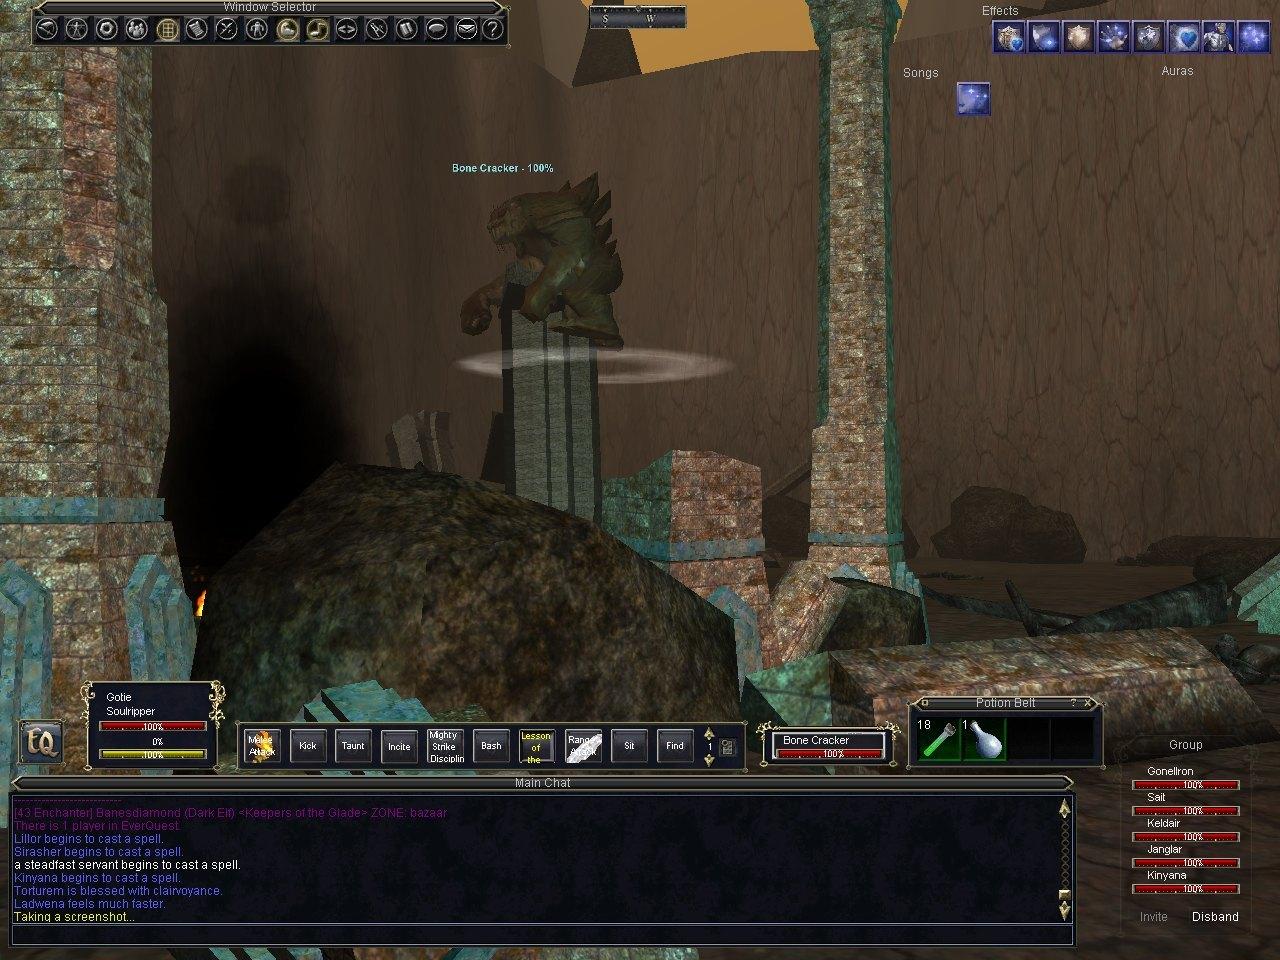 EverQuest (progression servers launch)